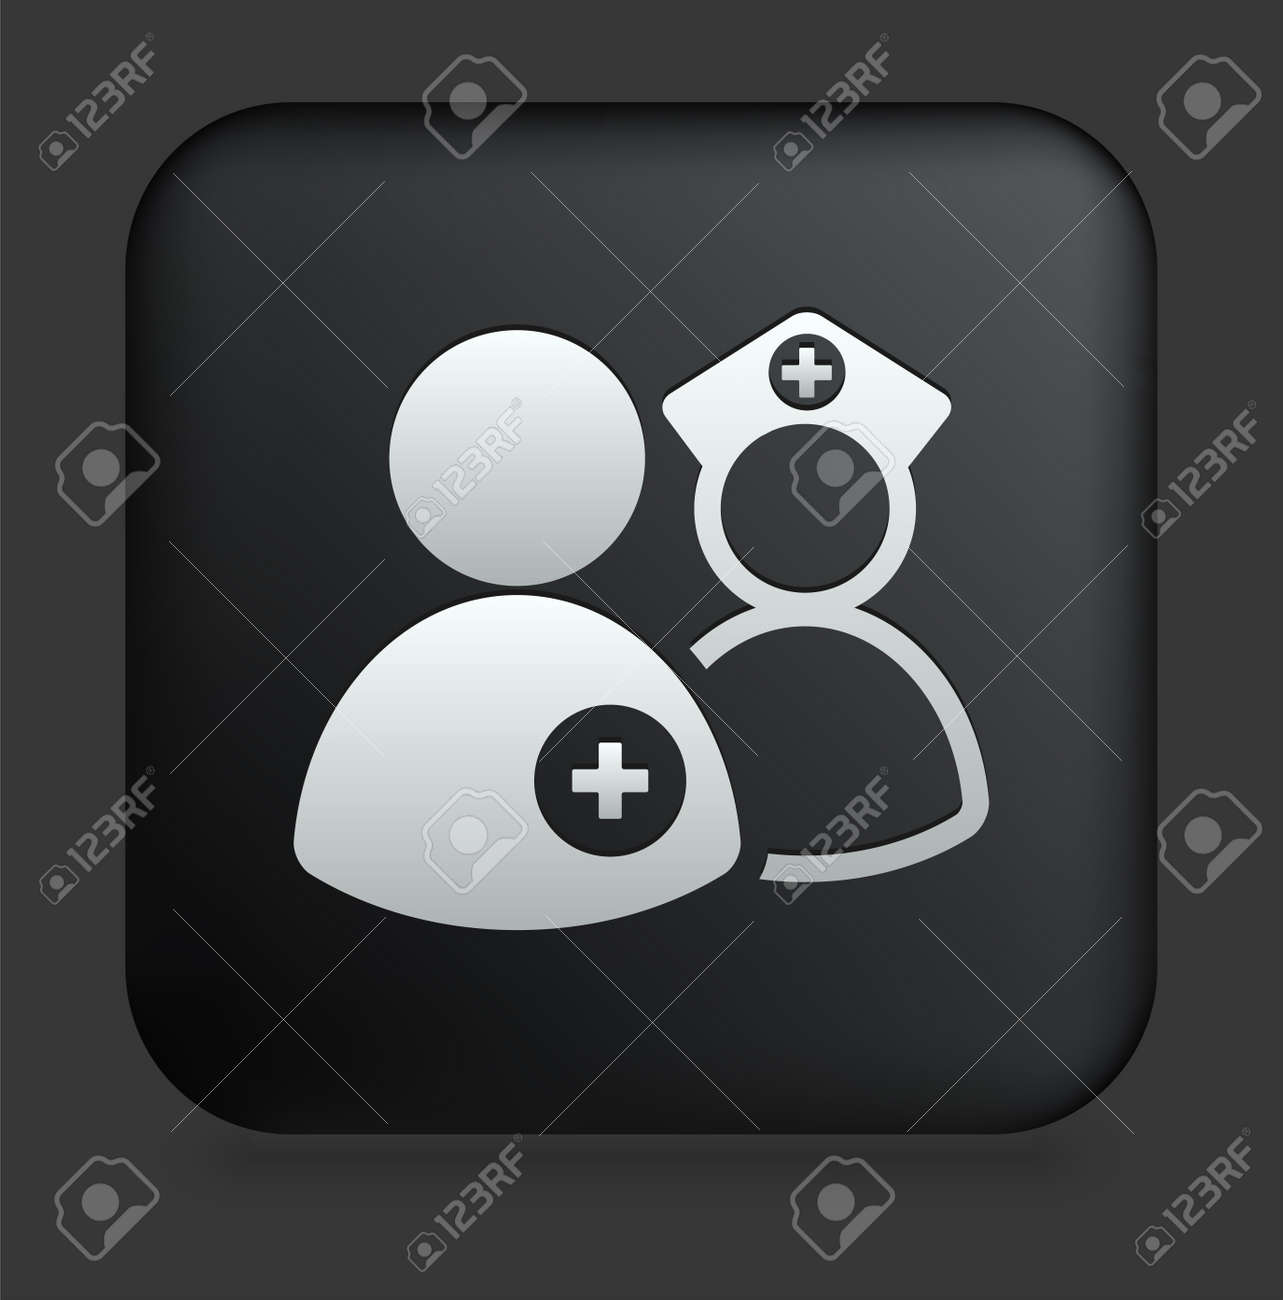 Medical Team Icon on Square Black Internet ButtonOriginal Illustration Stock Illustration - 7567894